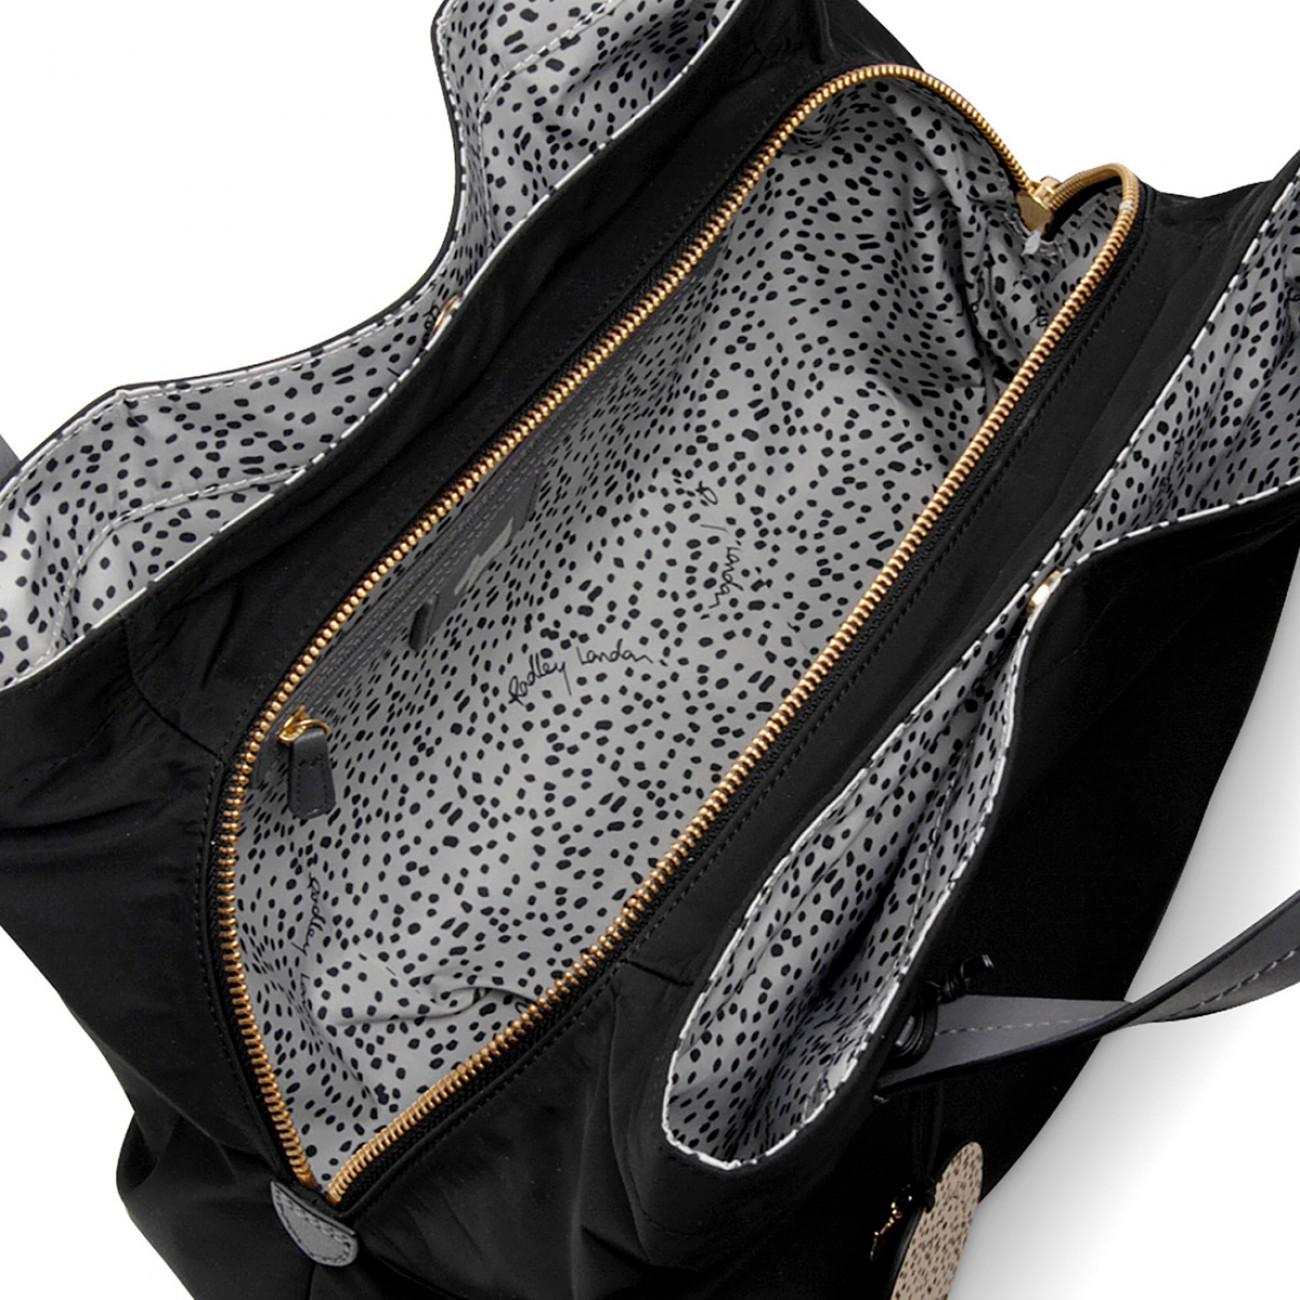 Radley Petersham Medium Multi-compartment Grab Bag in Black - Lyst 12e35e0d88d85